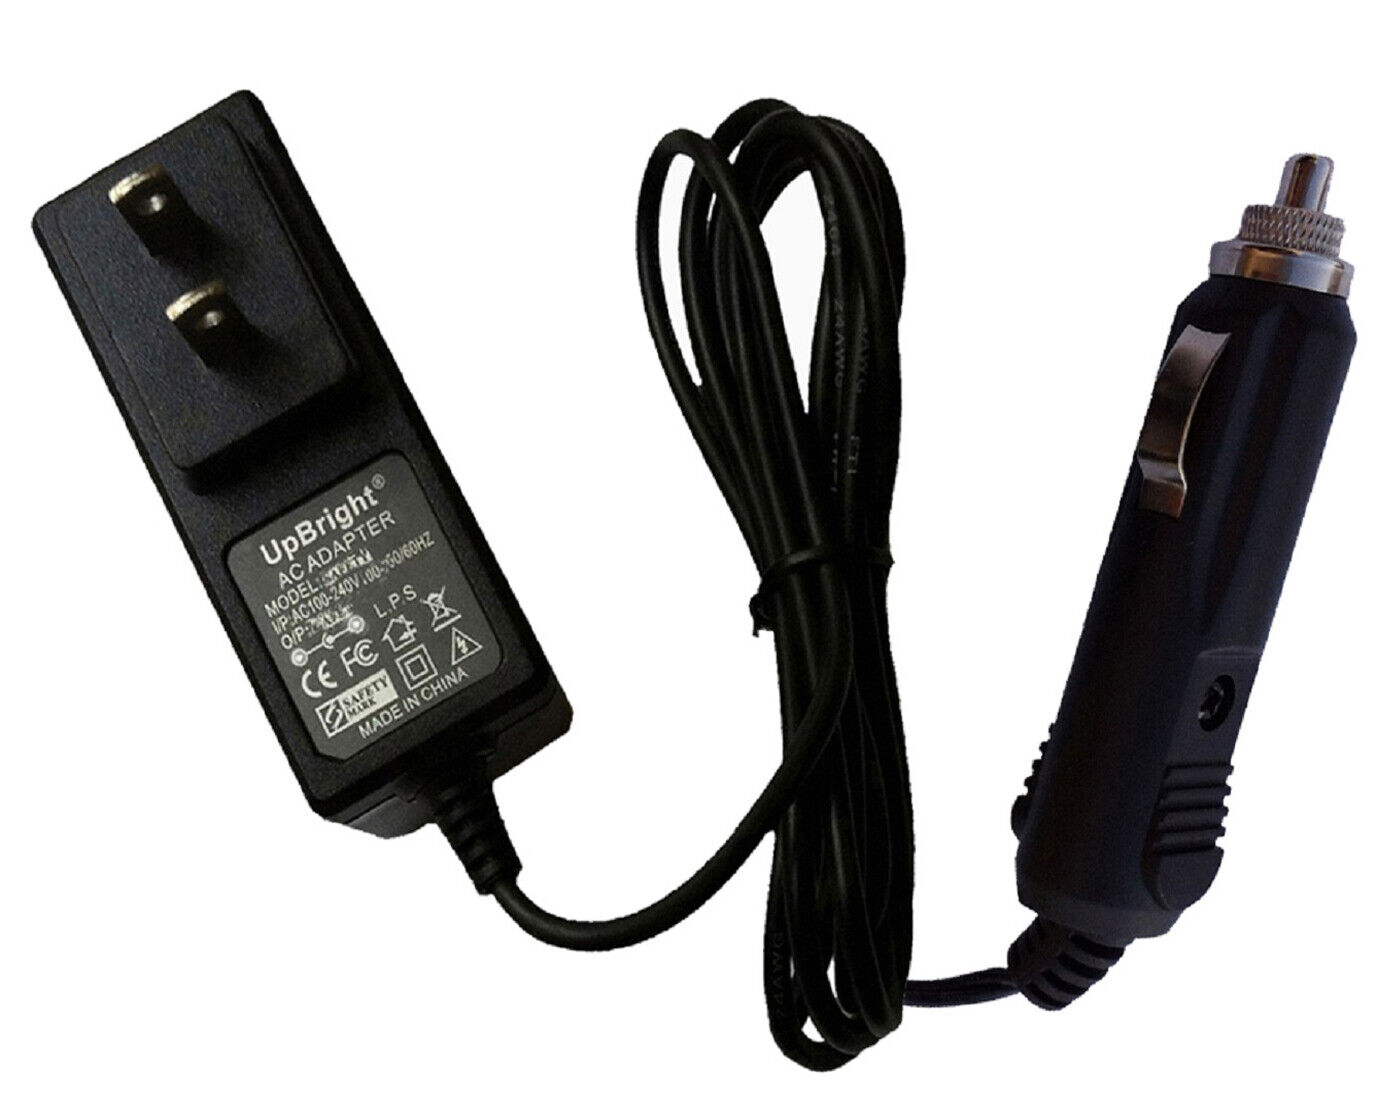 AC Adapter For Duralast BP-DL900 JUMP START BPDL900 Jump Starter Battery Charger